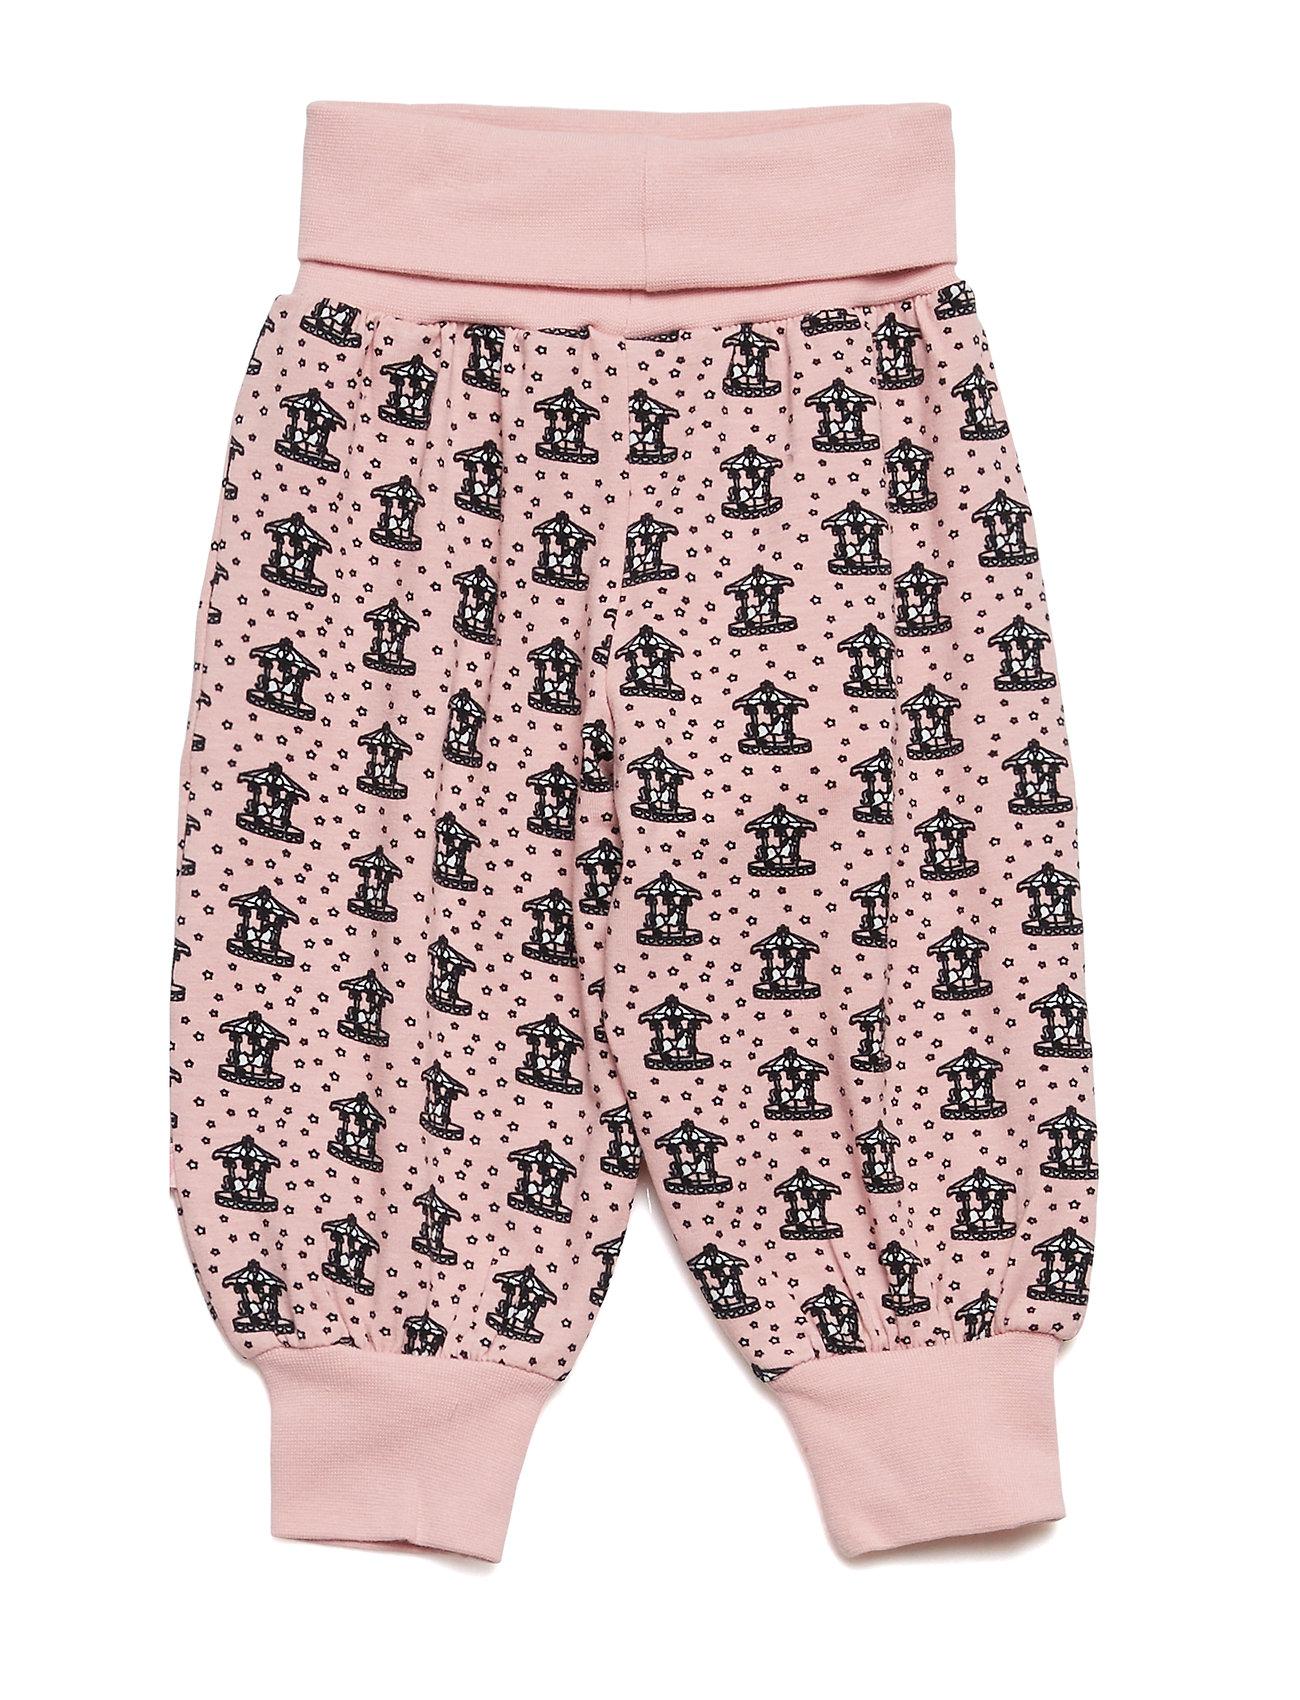 Småfolk Baby pants Waistband. Kenzie's carousel - SILVER PINK